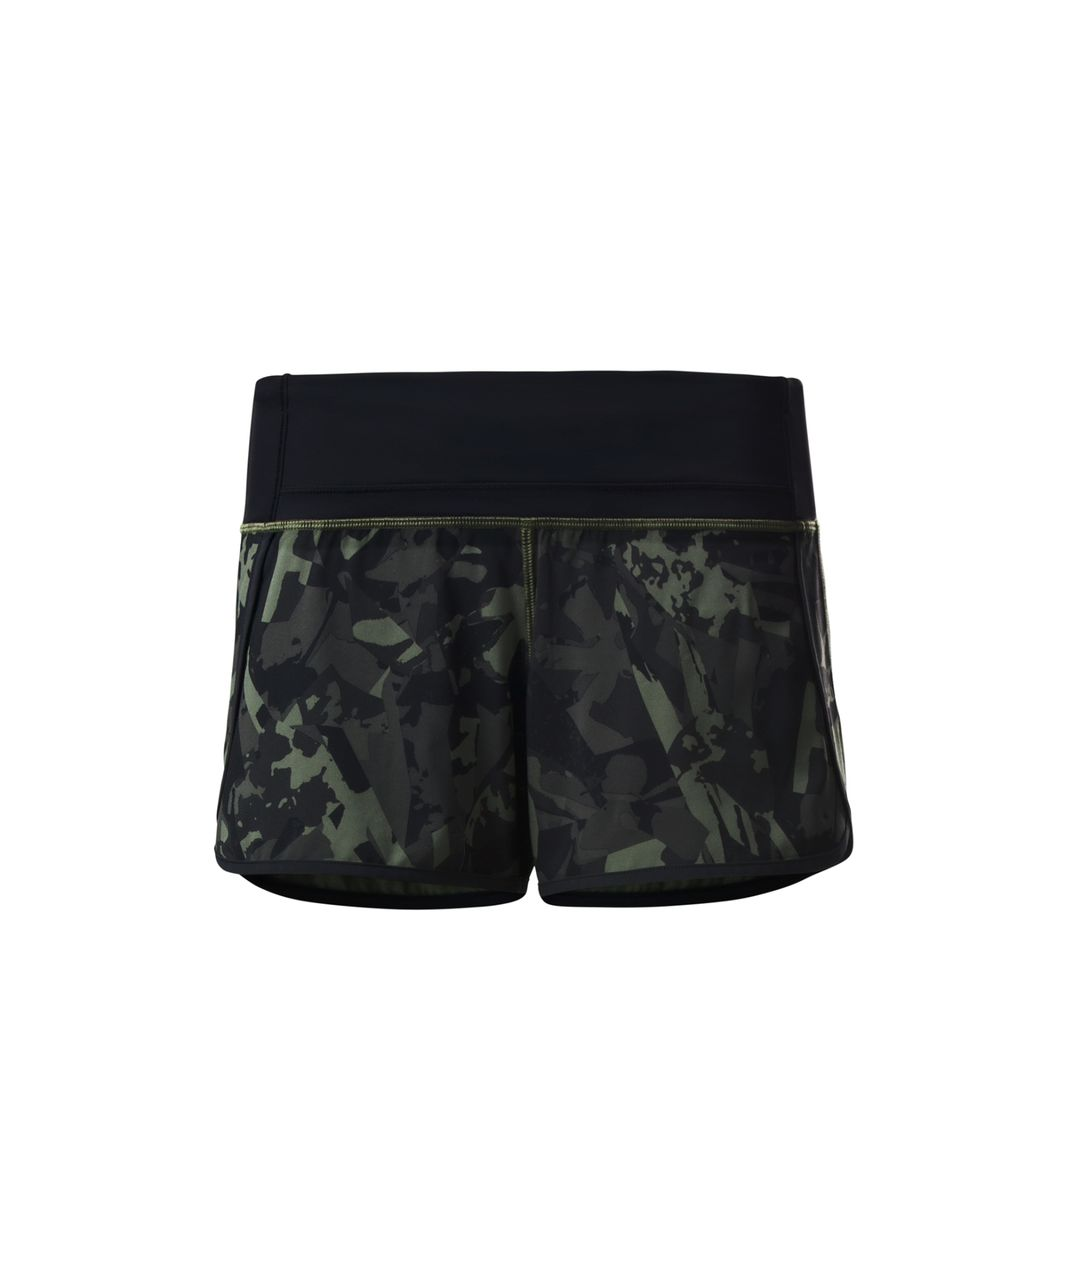 Lululemon Run Times Short (4-way Stretch) - Pop Cut Fatigue Green Black / Black